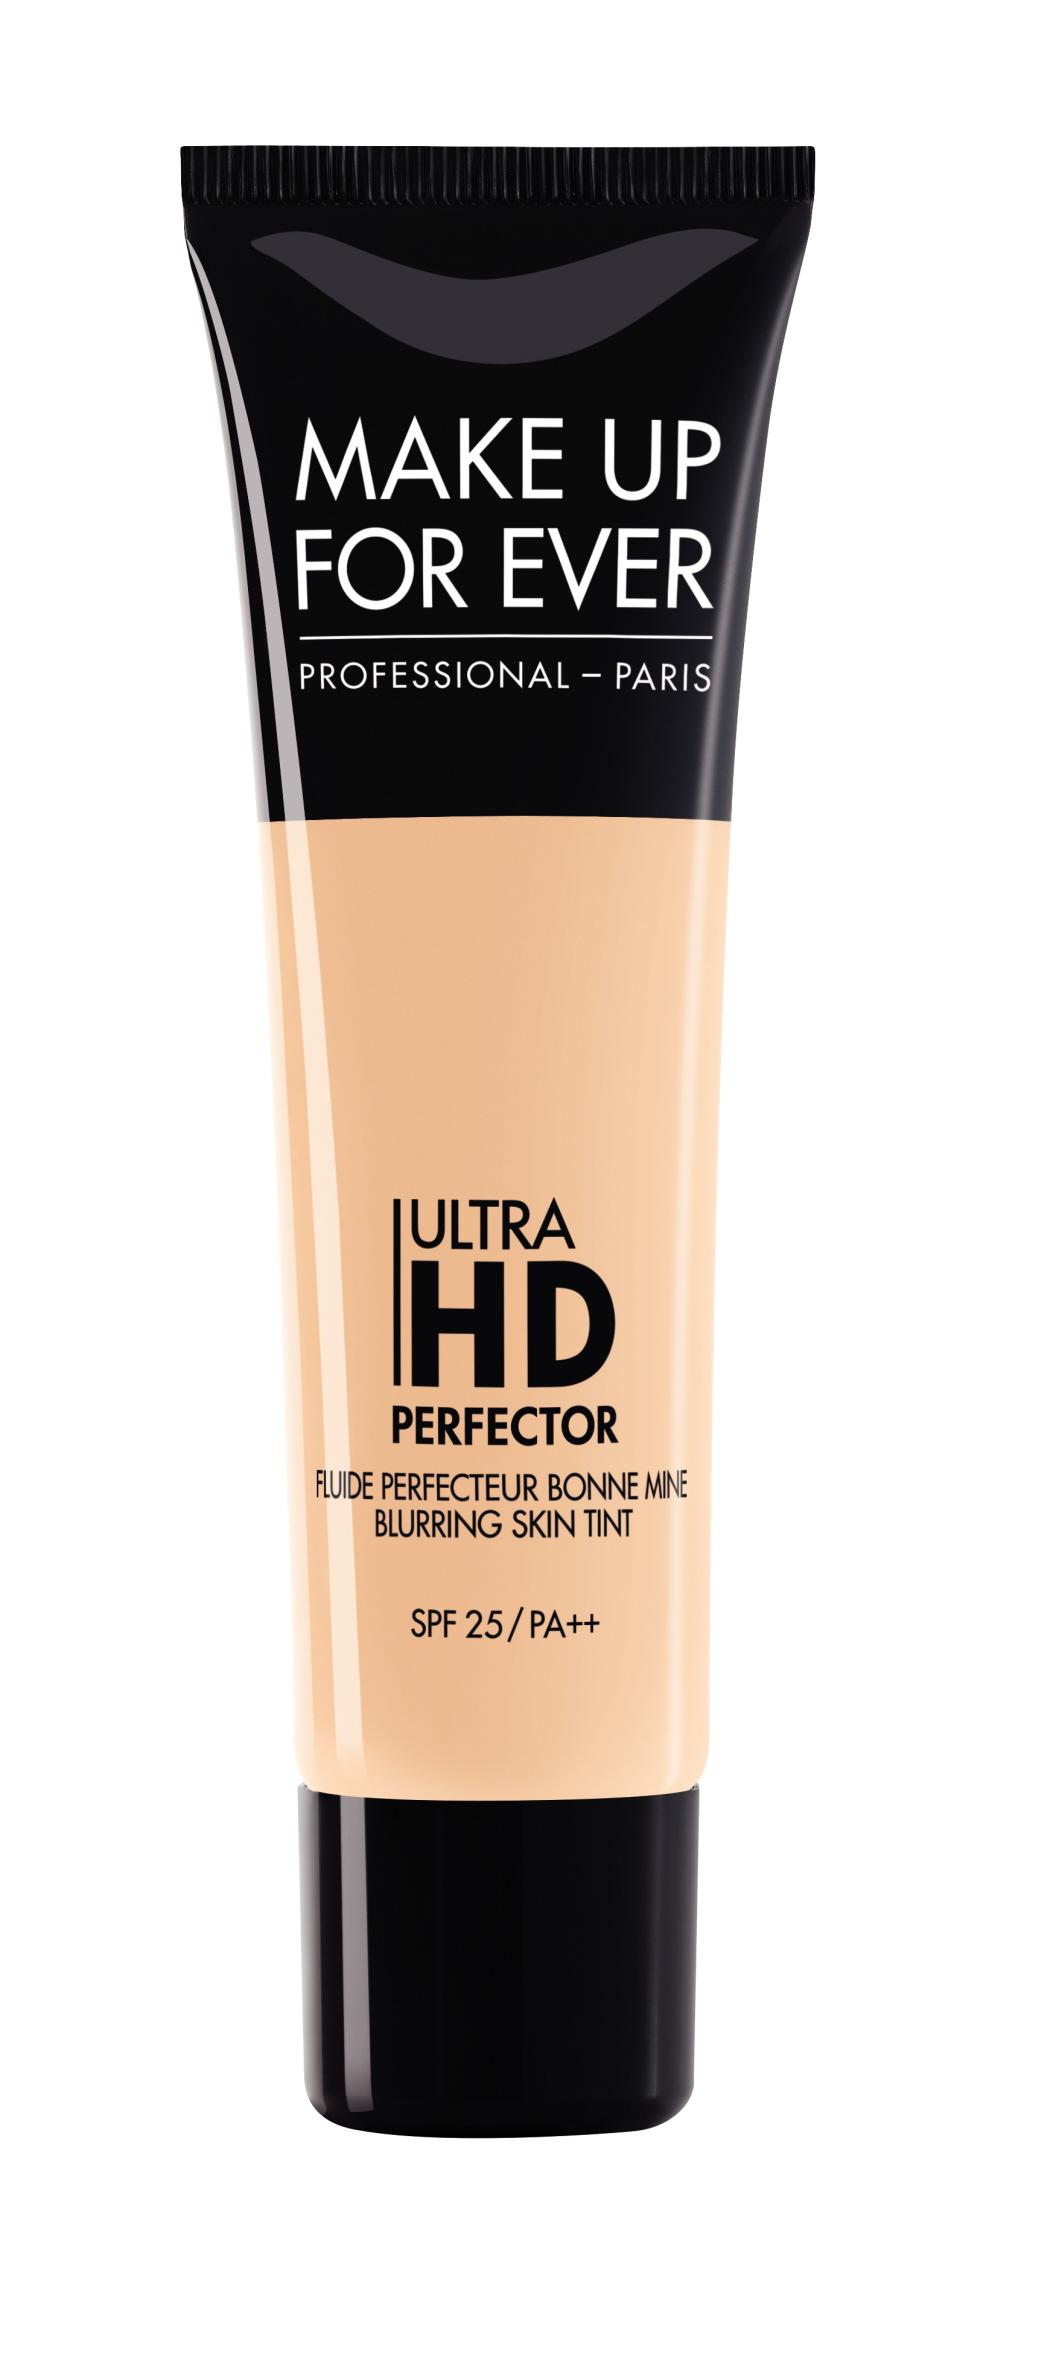 Тональный крем для лица Ultra HD Perfector blurring skin tint spf 25/pa++ 30 мл (2 Розовый песок) Make Up For Ever